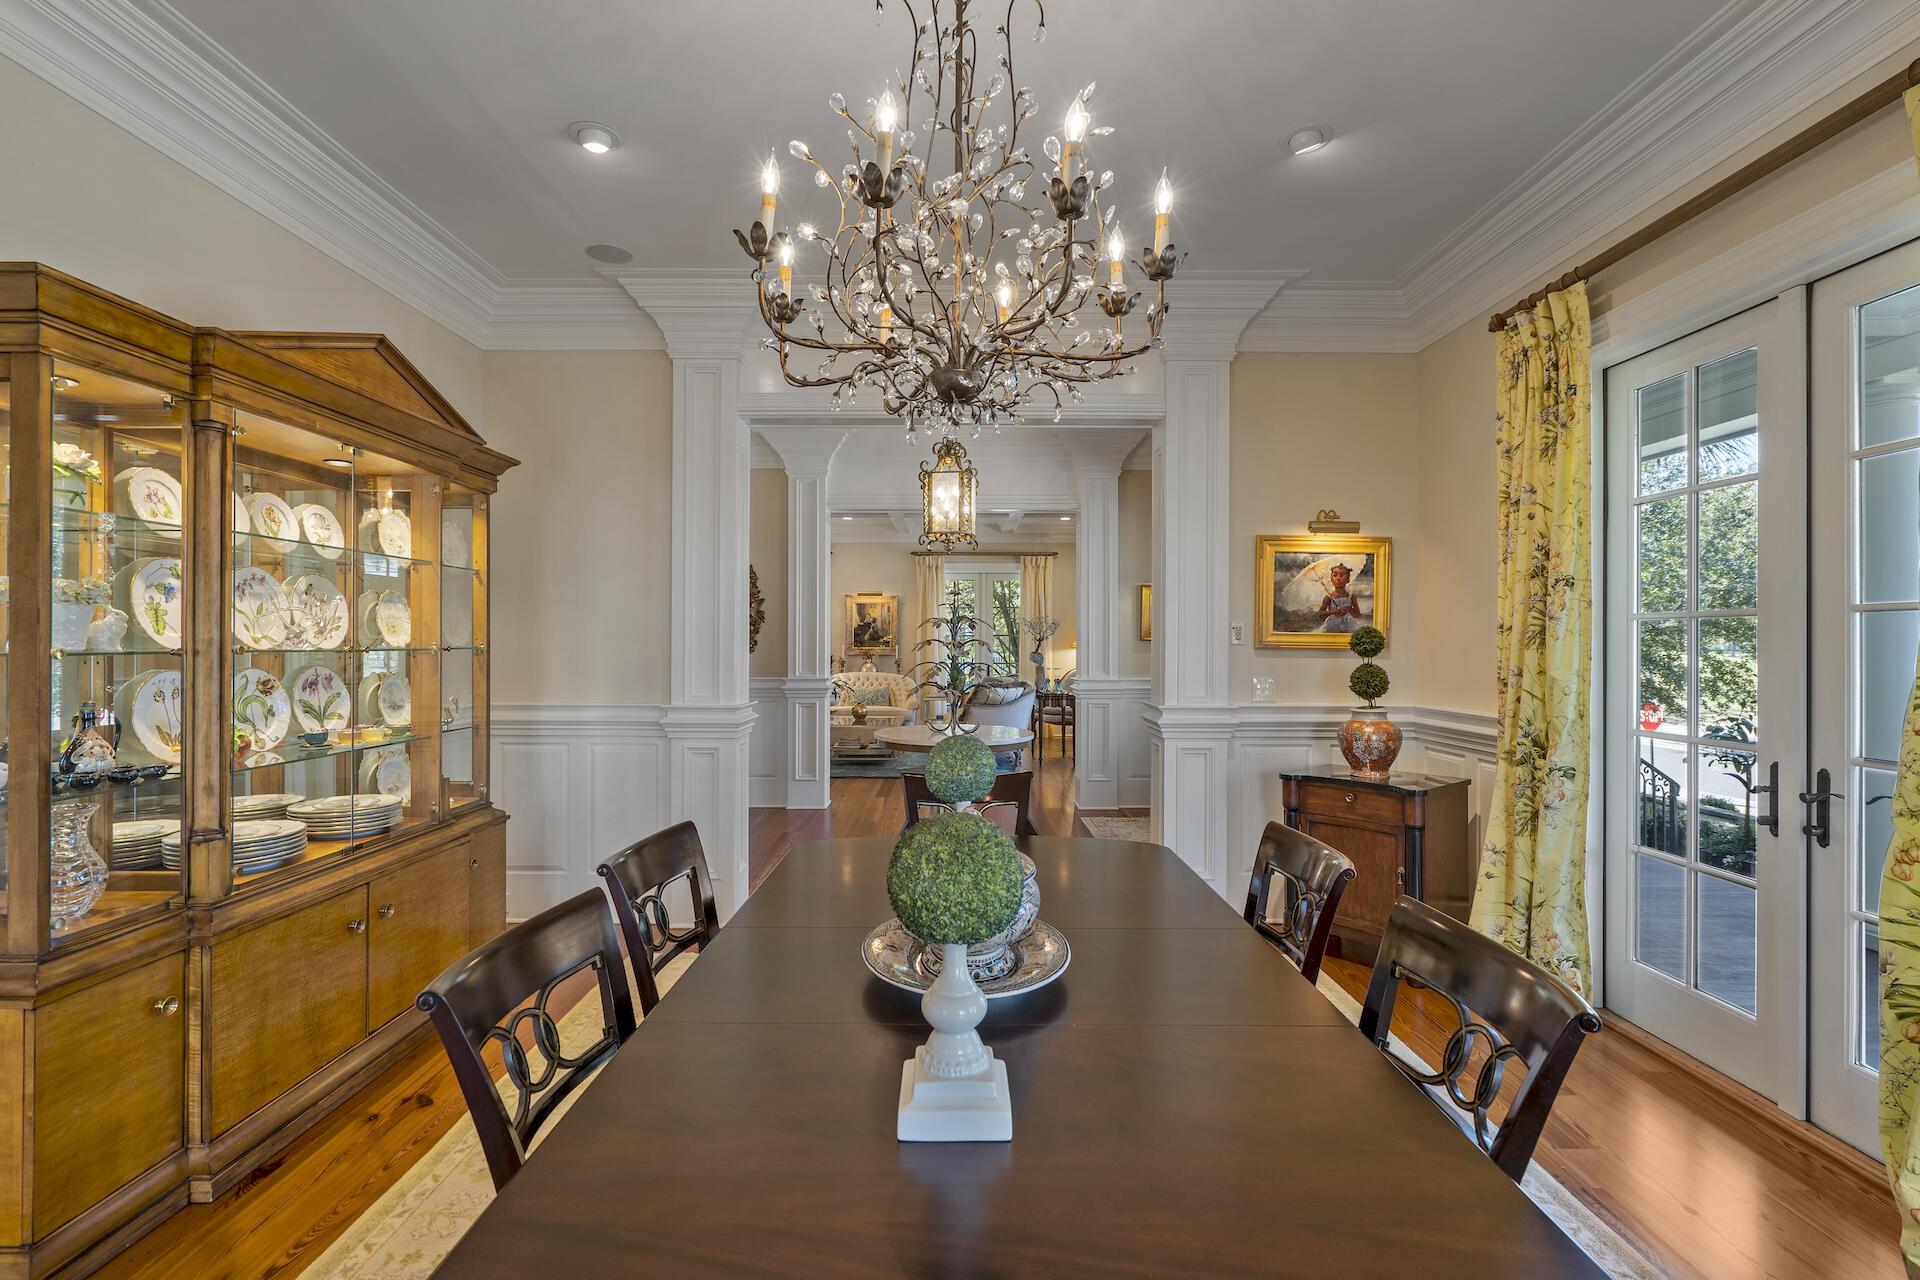 Daniel Island Homes For Sale - 623 Island Park, Charleston, SC - 29